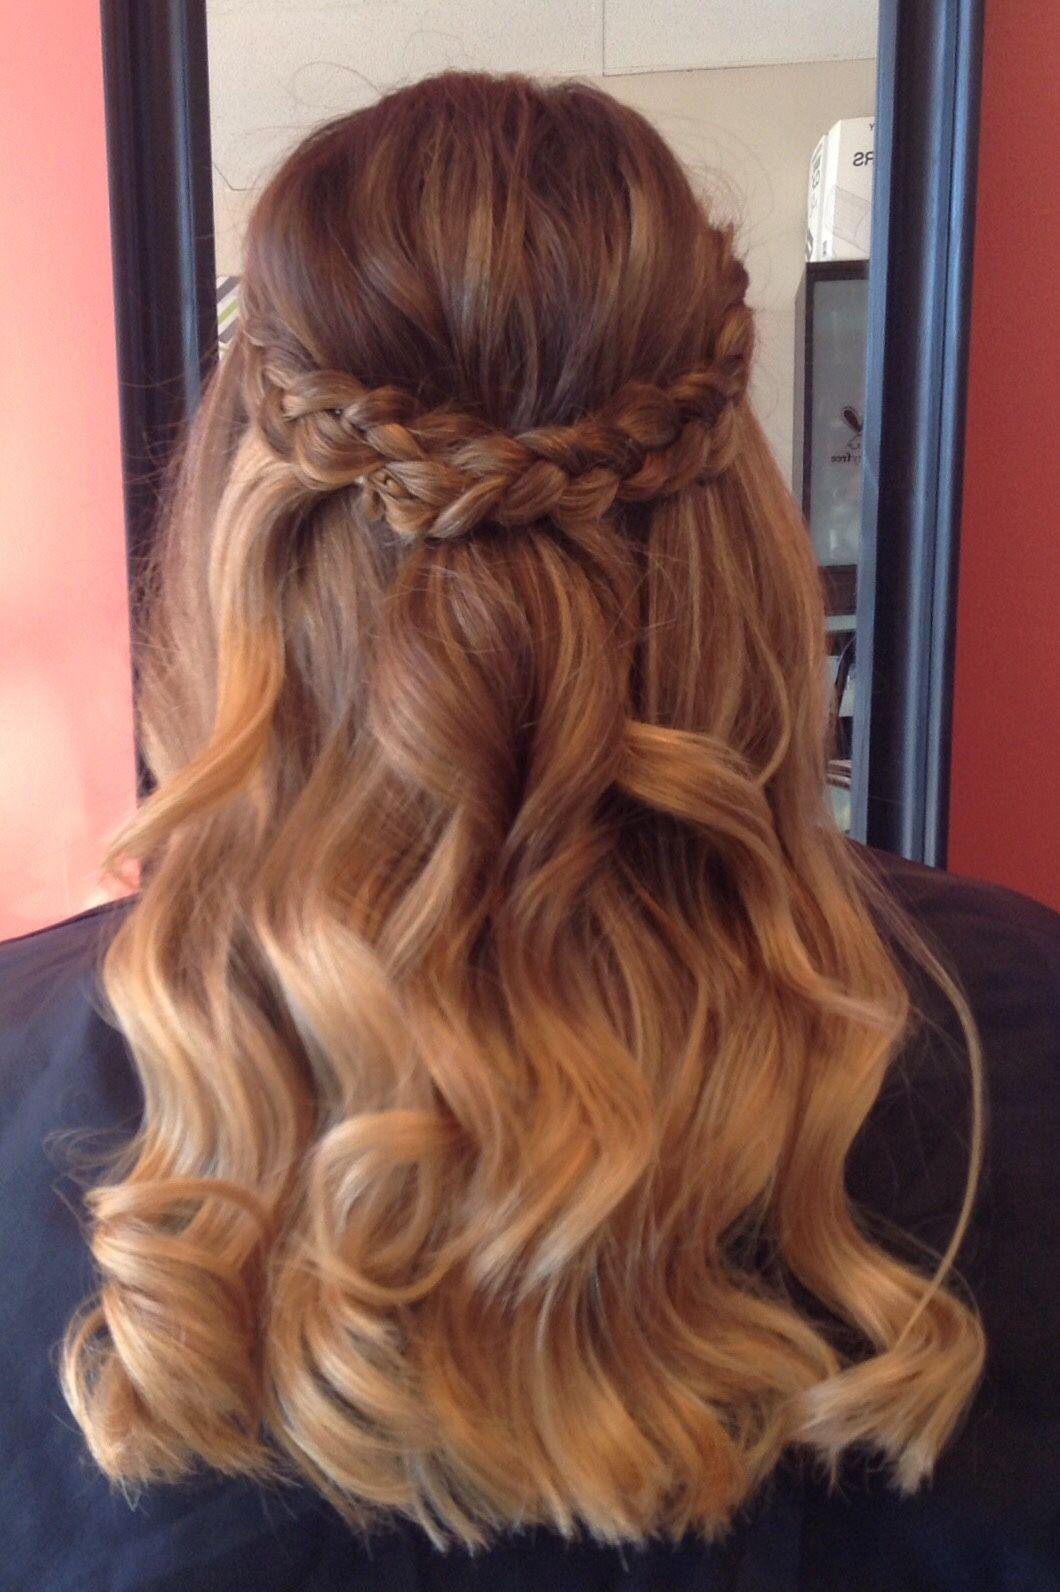 Half up do with braid #bridalhair #curls #updo | Braided ...